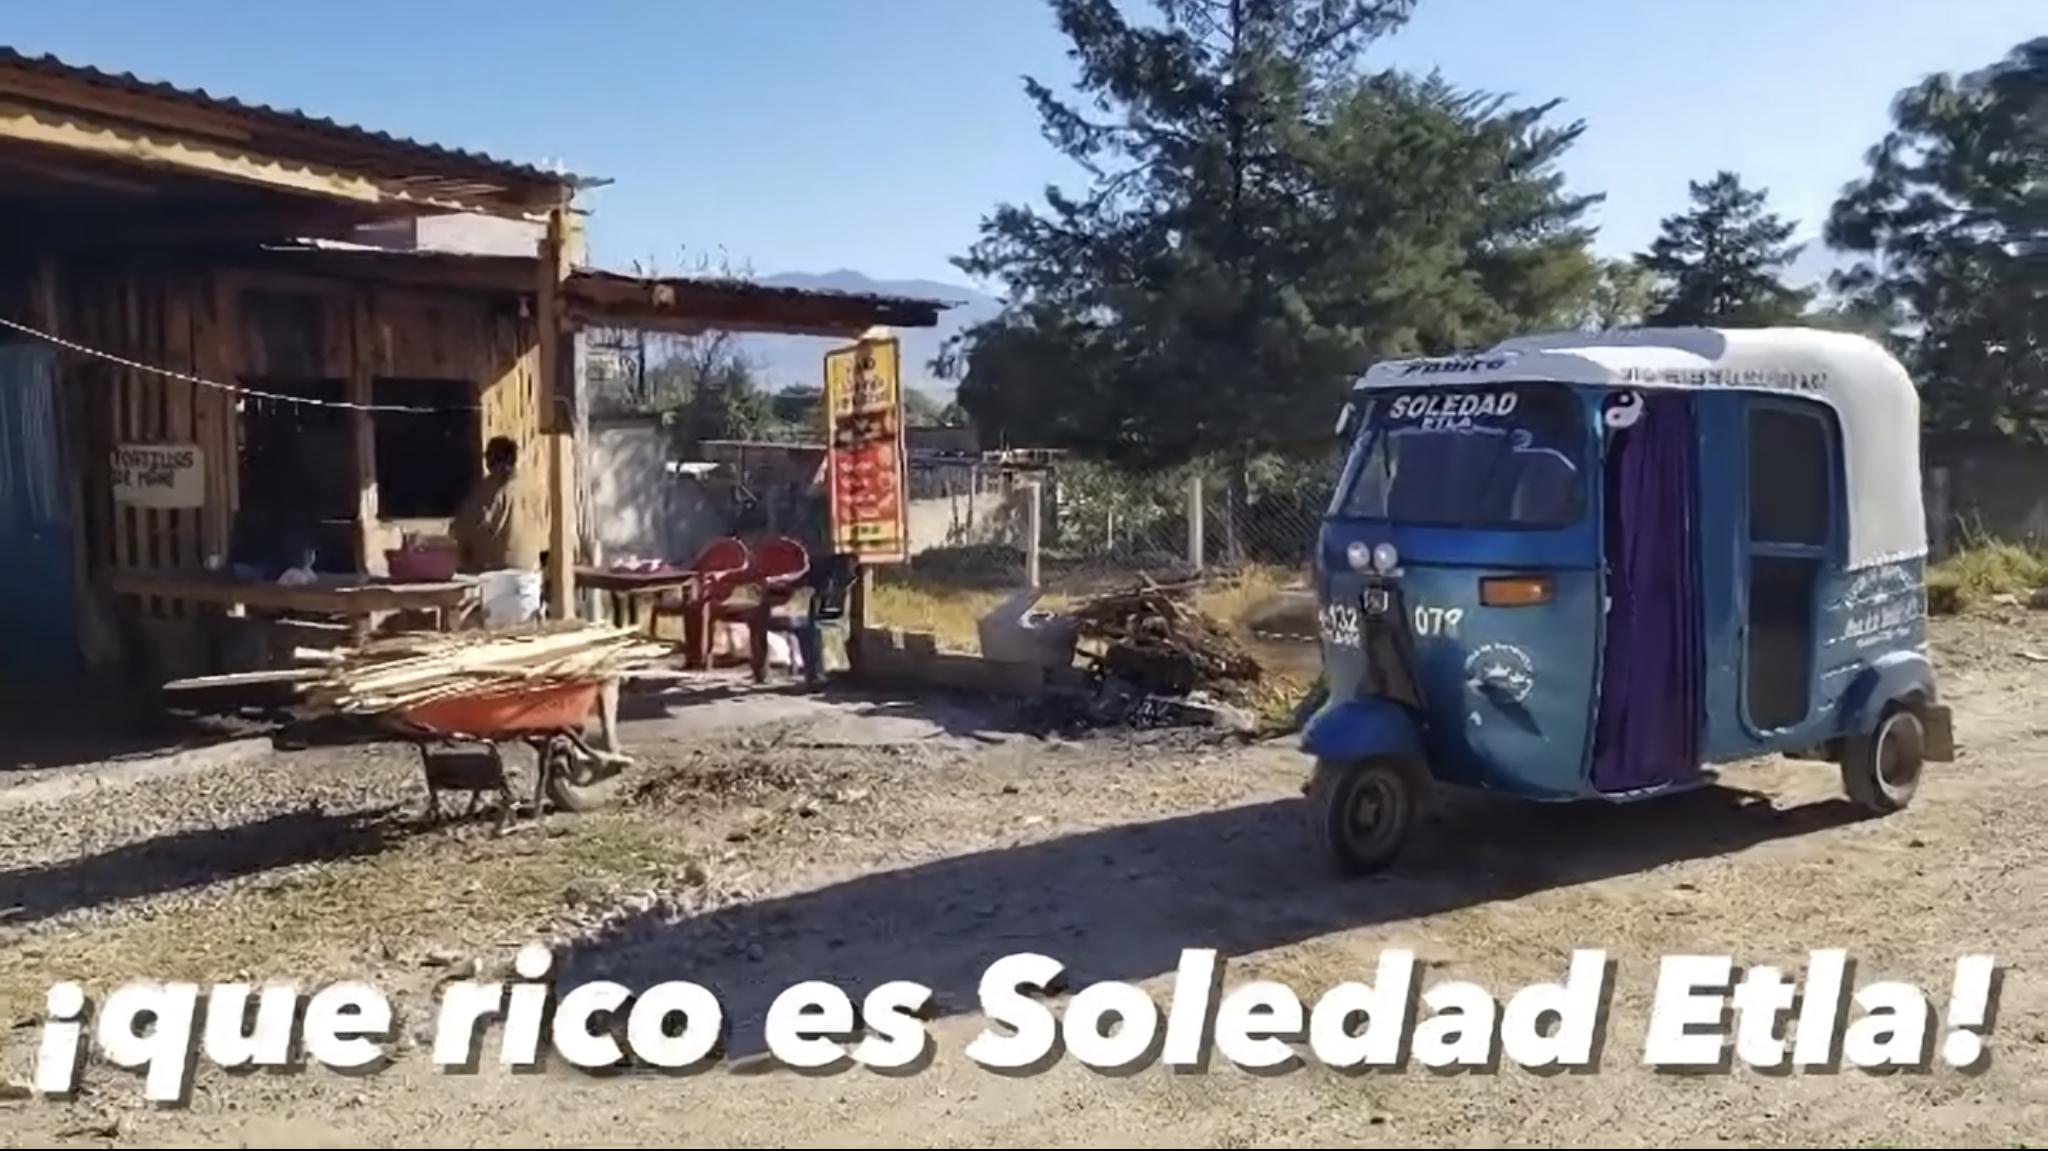 rustic kitchen and moto taxi in soledad etla oaxaca mexico